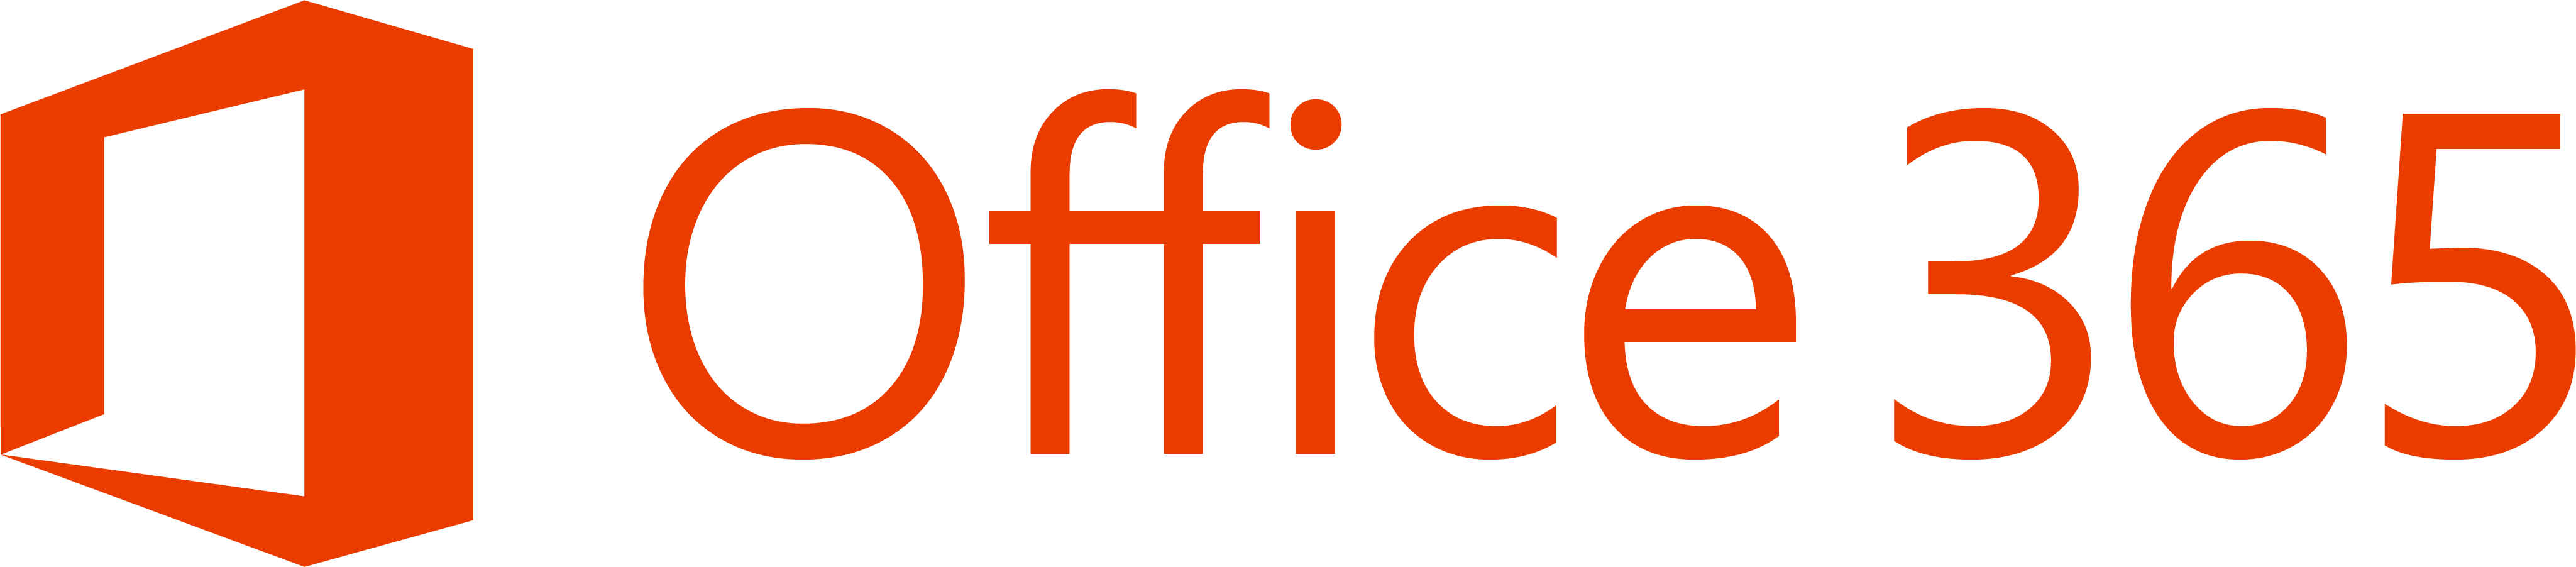 m-benefits-compatibility-listing-logo-3